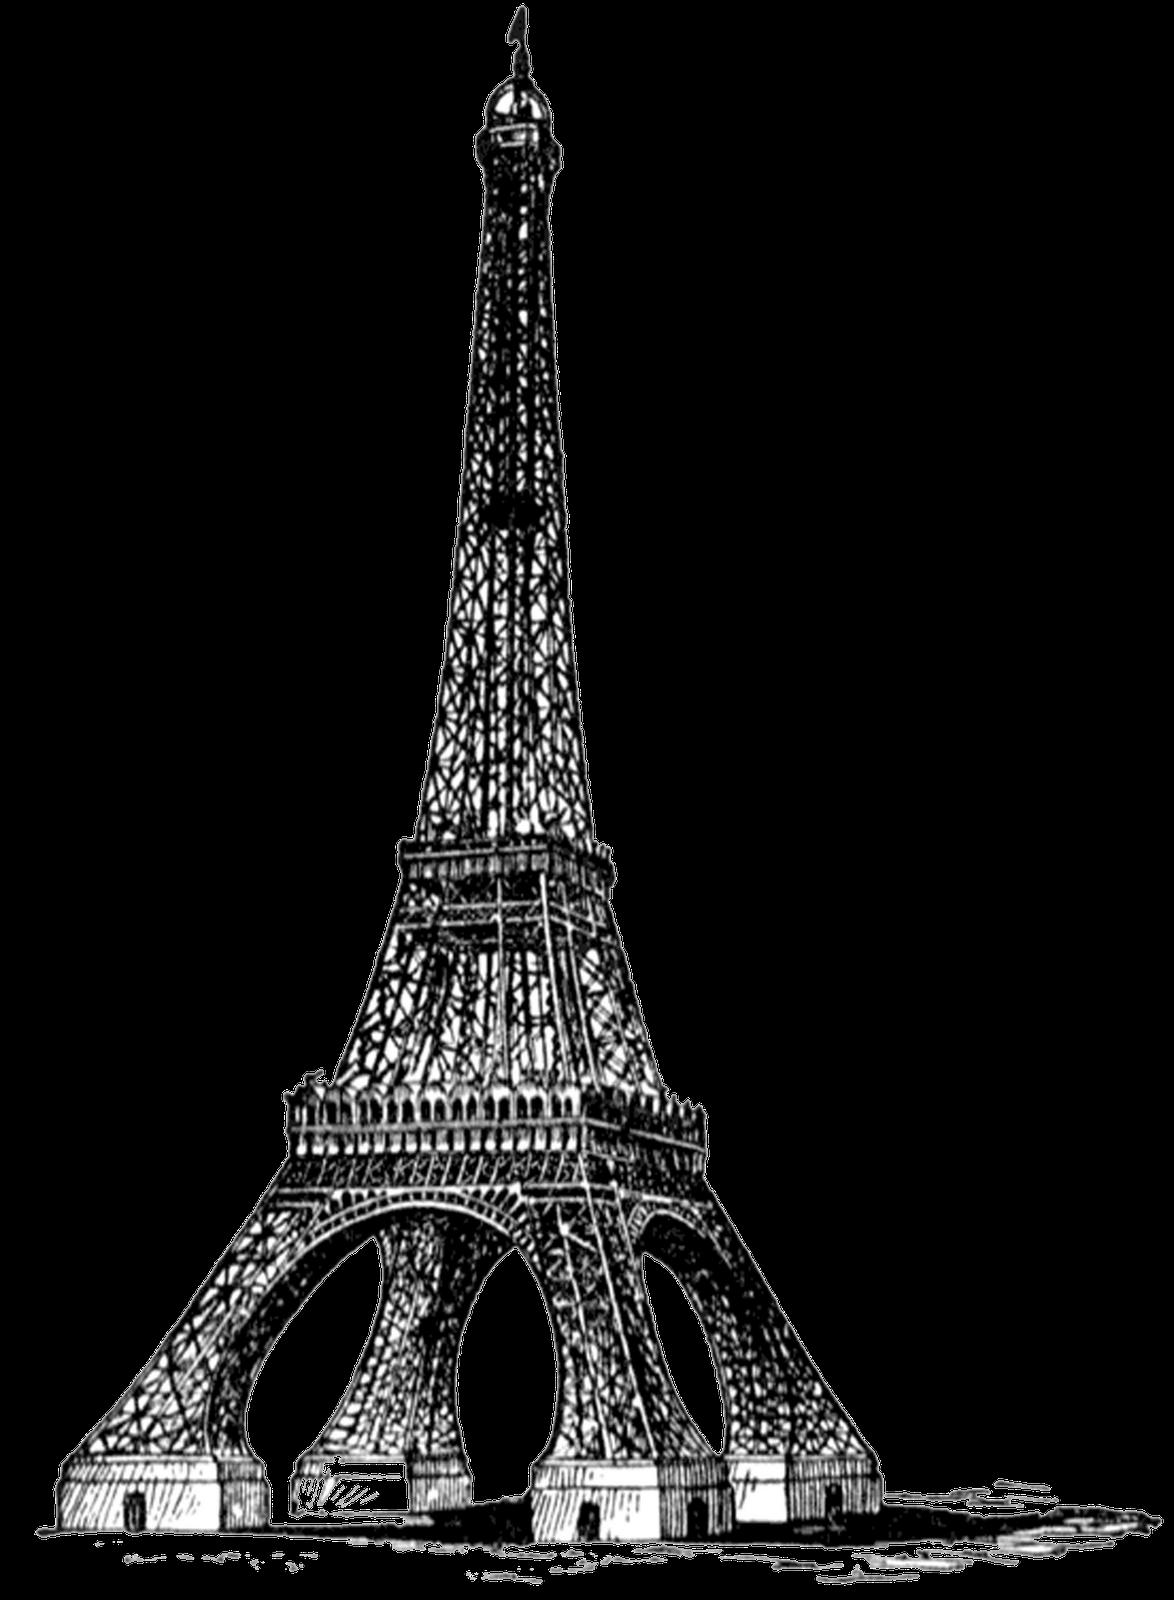 Transparent eiffel tower clipart jpg black and white Eiffel Tower Bw Full Vintage transparent PNG - StickPNG jpg black and white